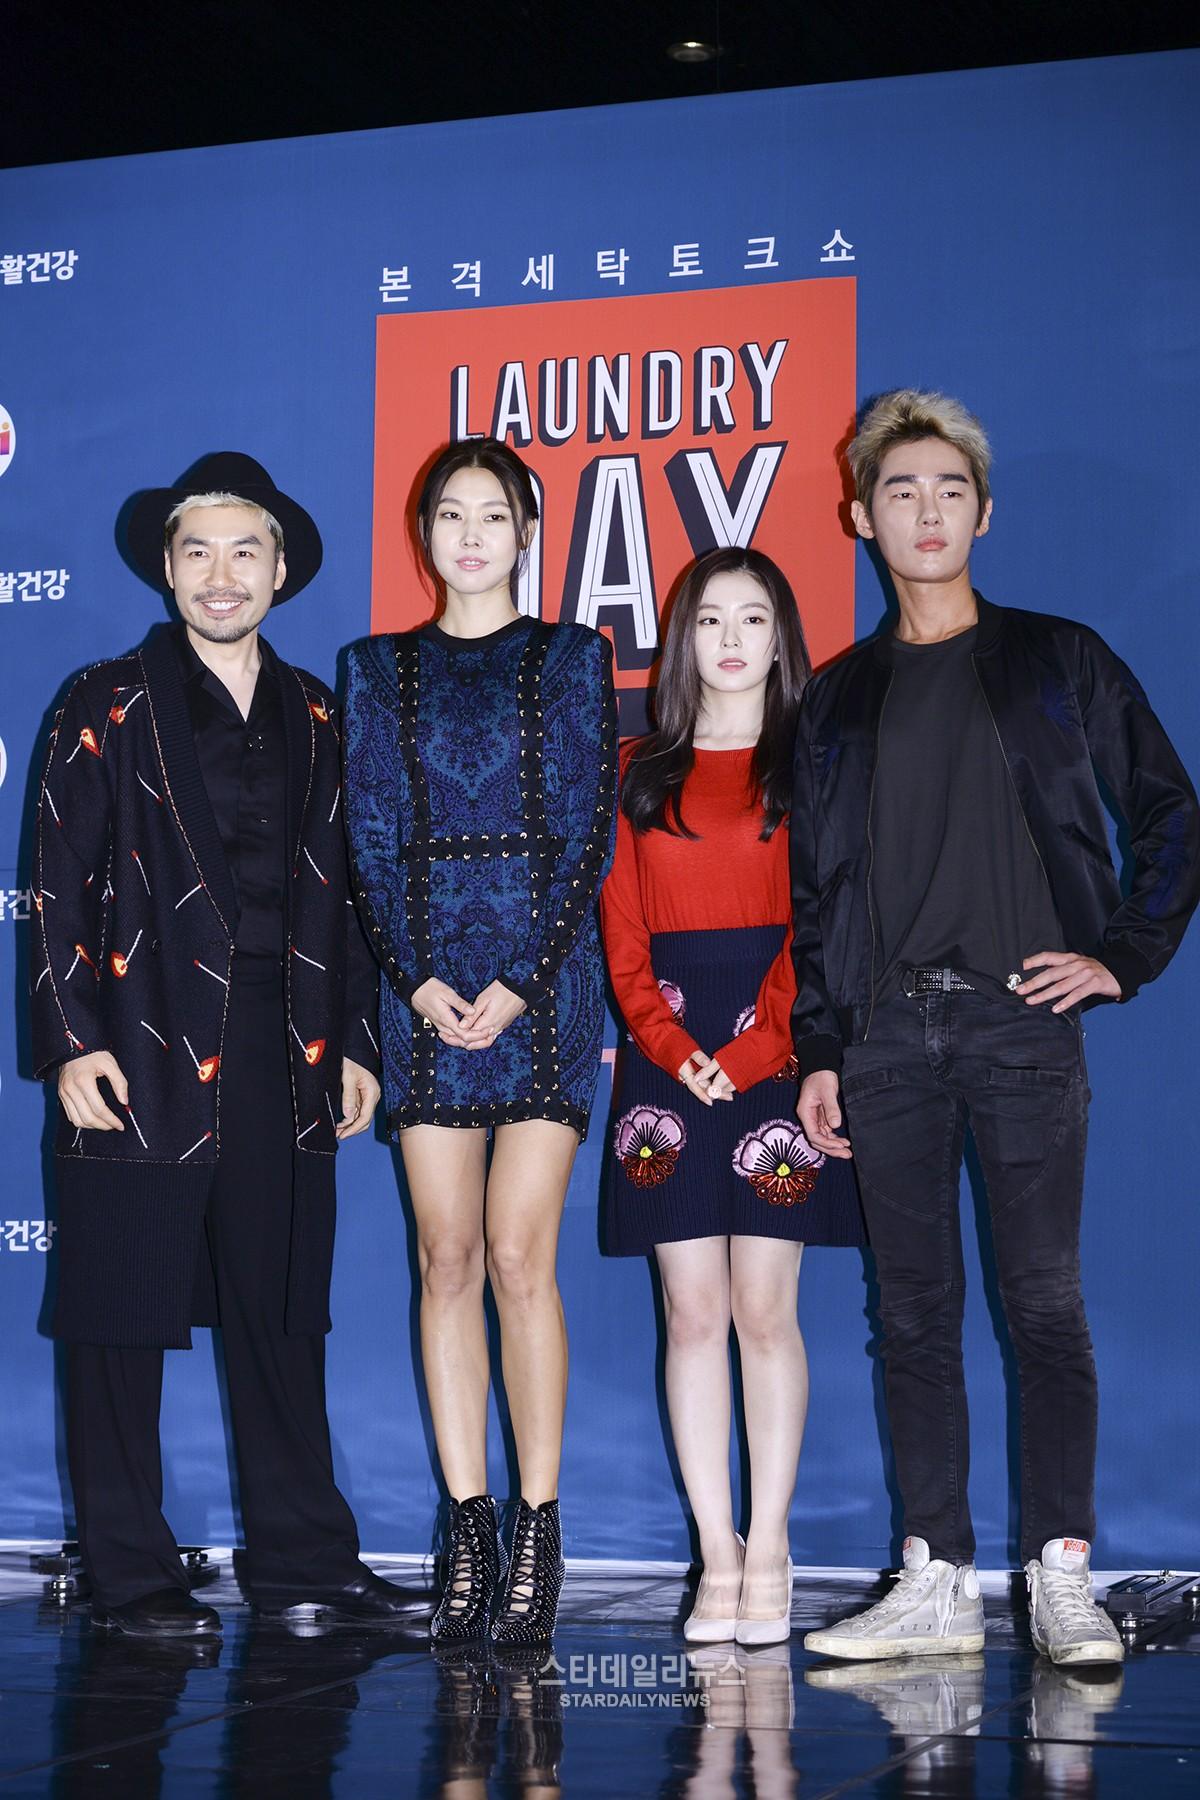 Noh Hong Chul Han Hye Jin Red Velvet Irene Heo Ji Woong